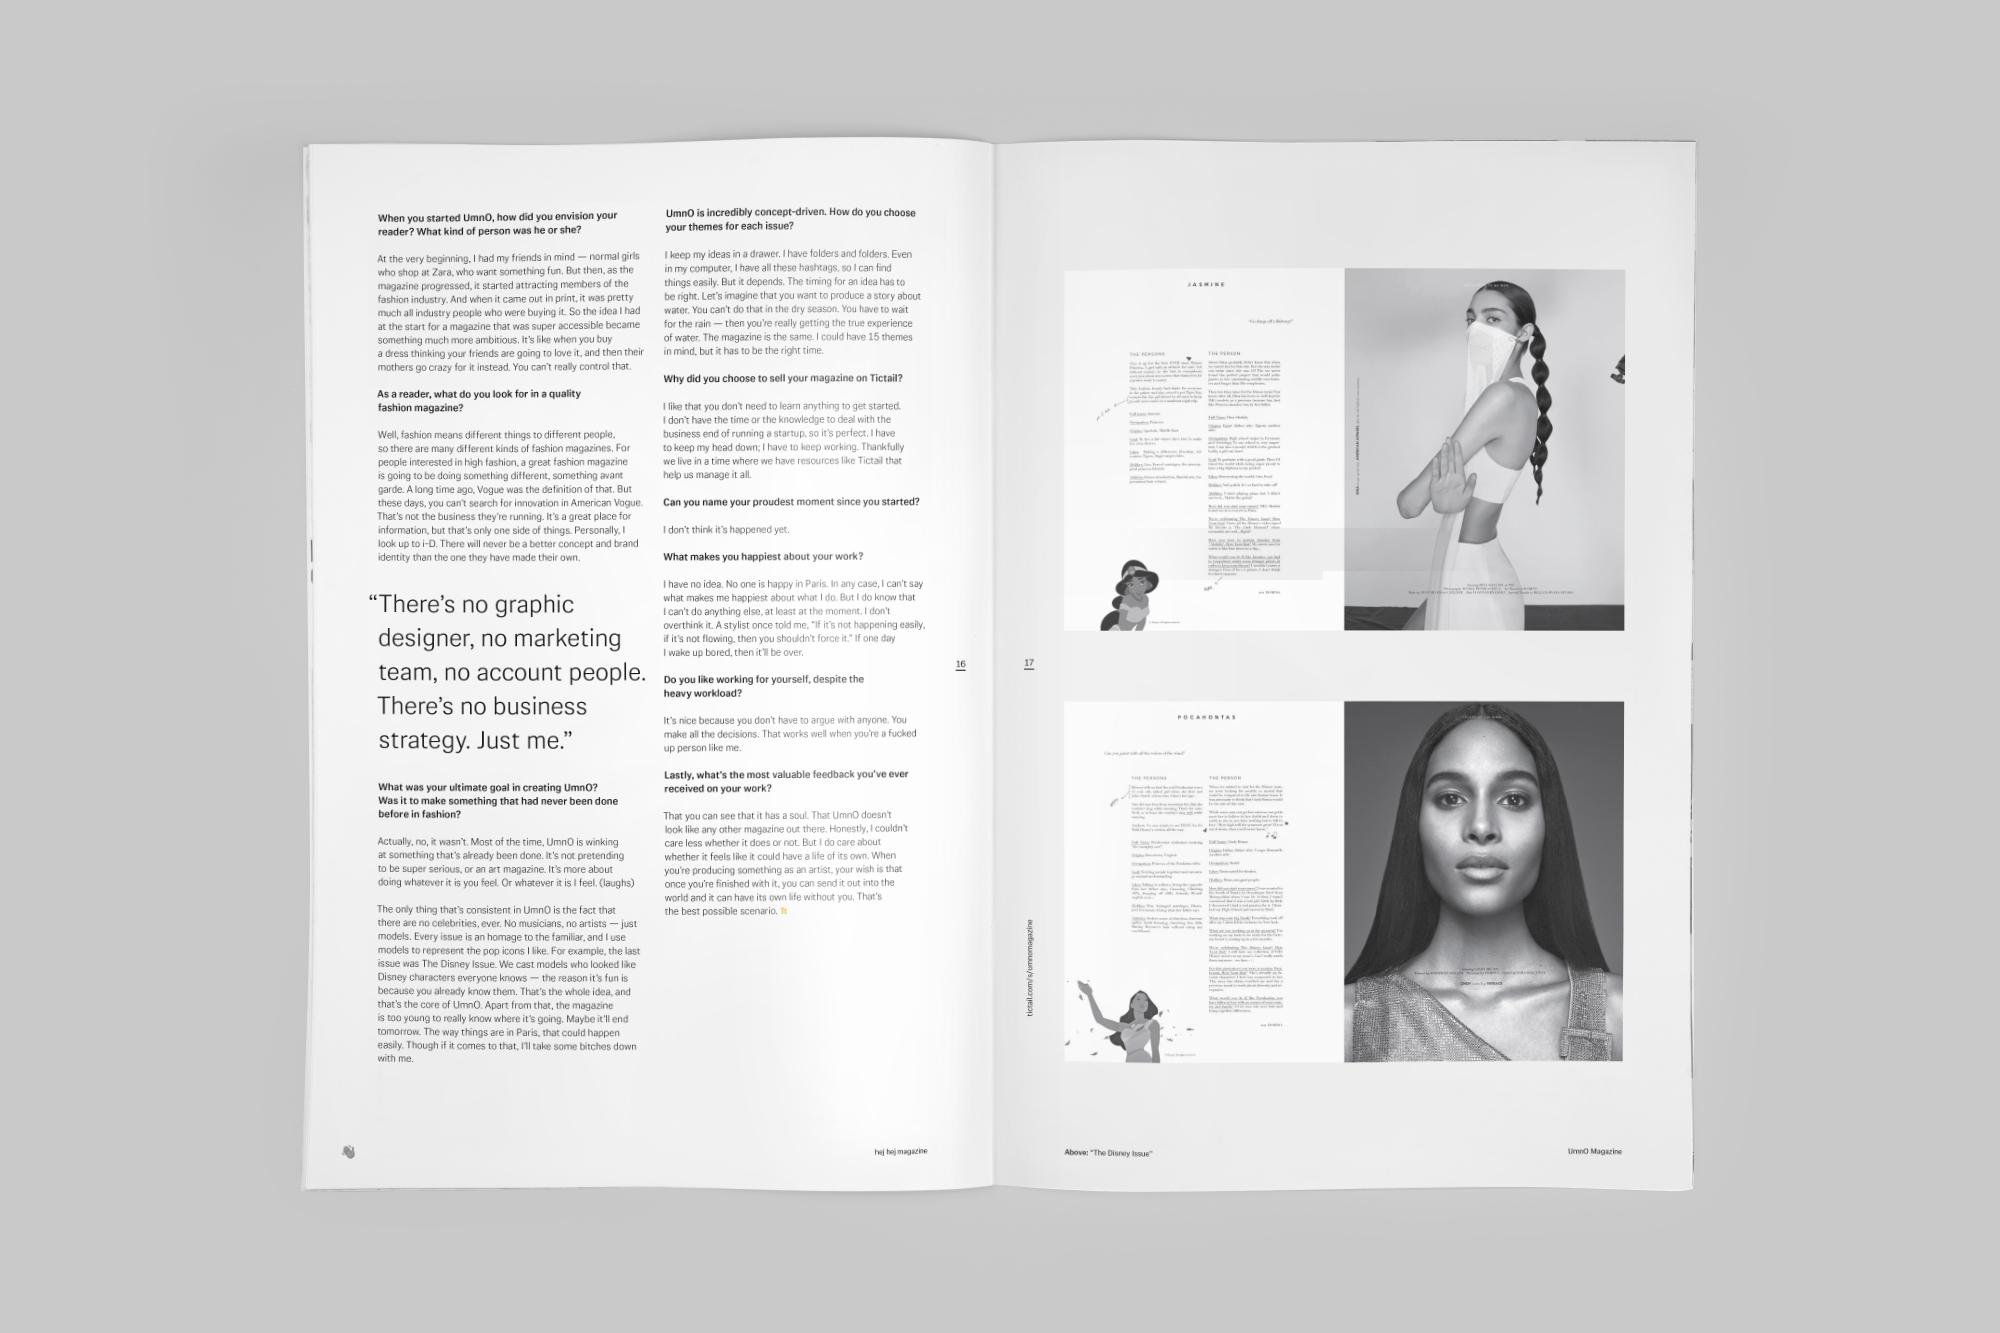 Tictail_Hejhej_Magazine_0008_Spread 08.jpg